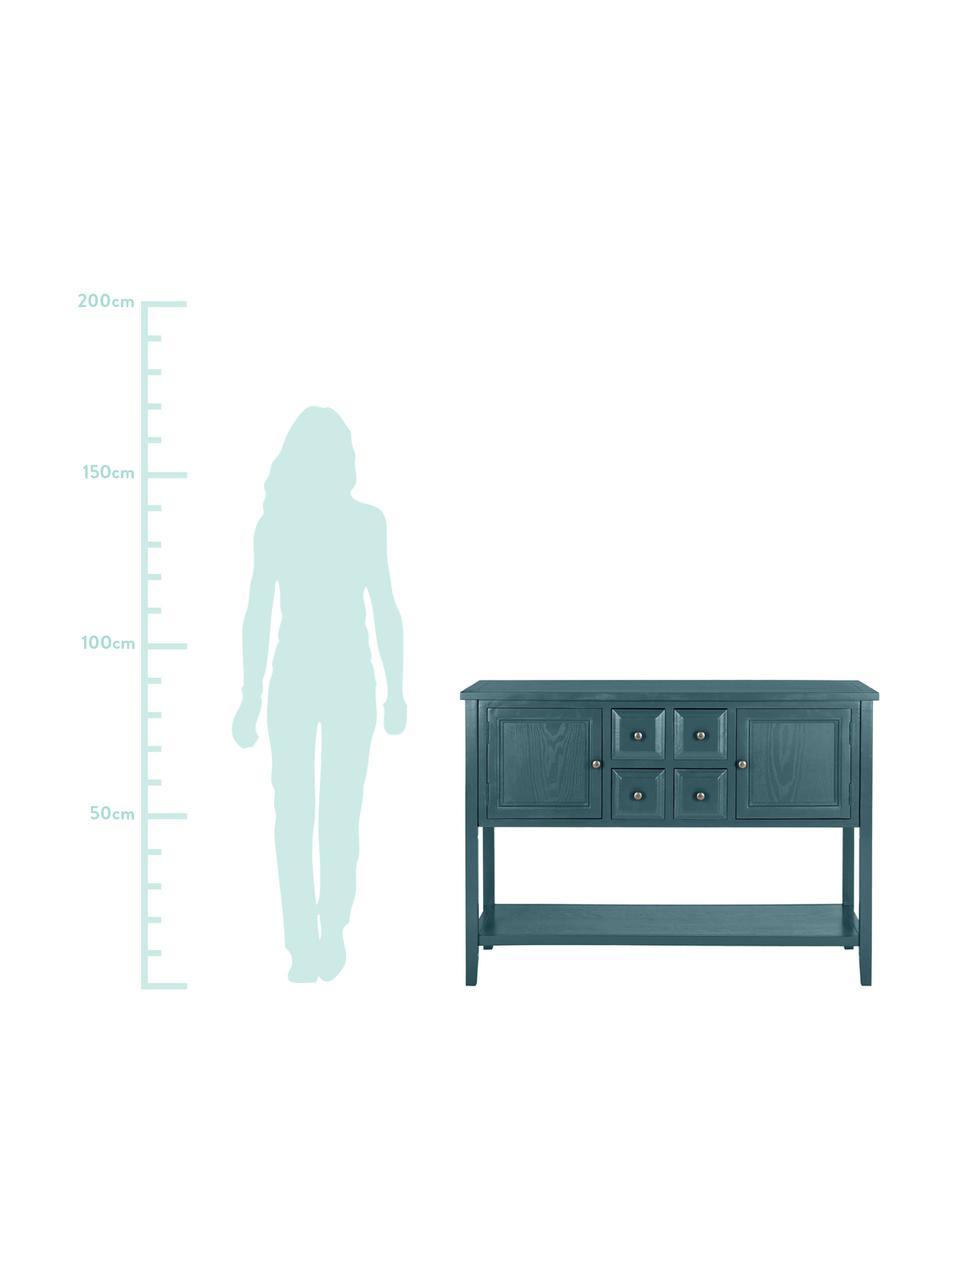 Blaues Sideboard Amy im Landhausstil, Korpus: Ulmenholz, Kiefernholz, l, Griffe und Scharniere: Metall, verzinkt, Petrol, 116 x 86 cm